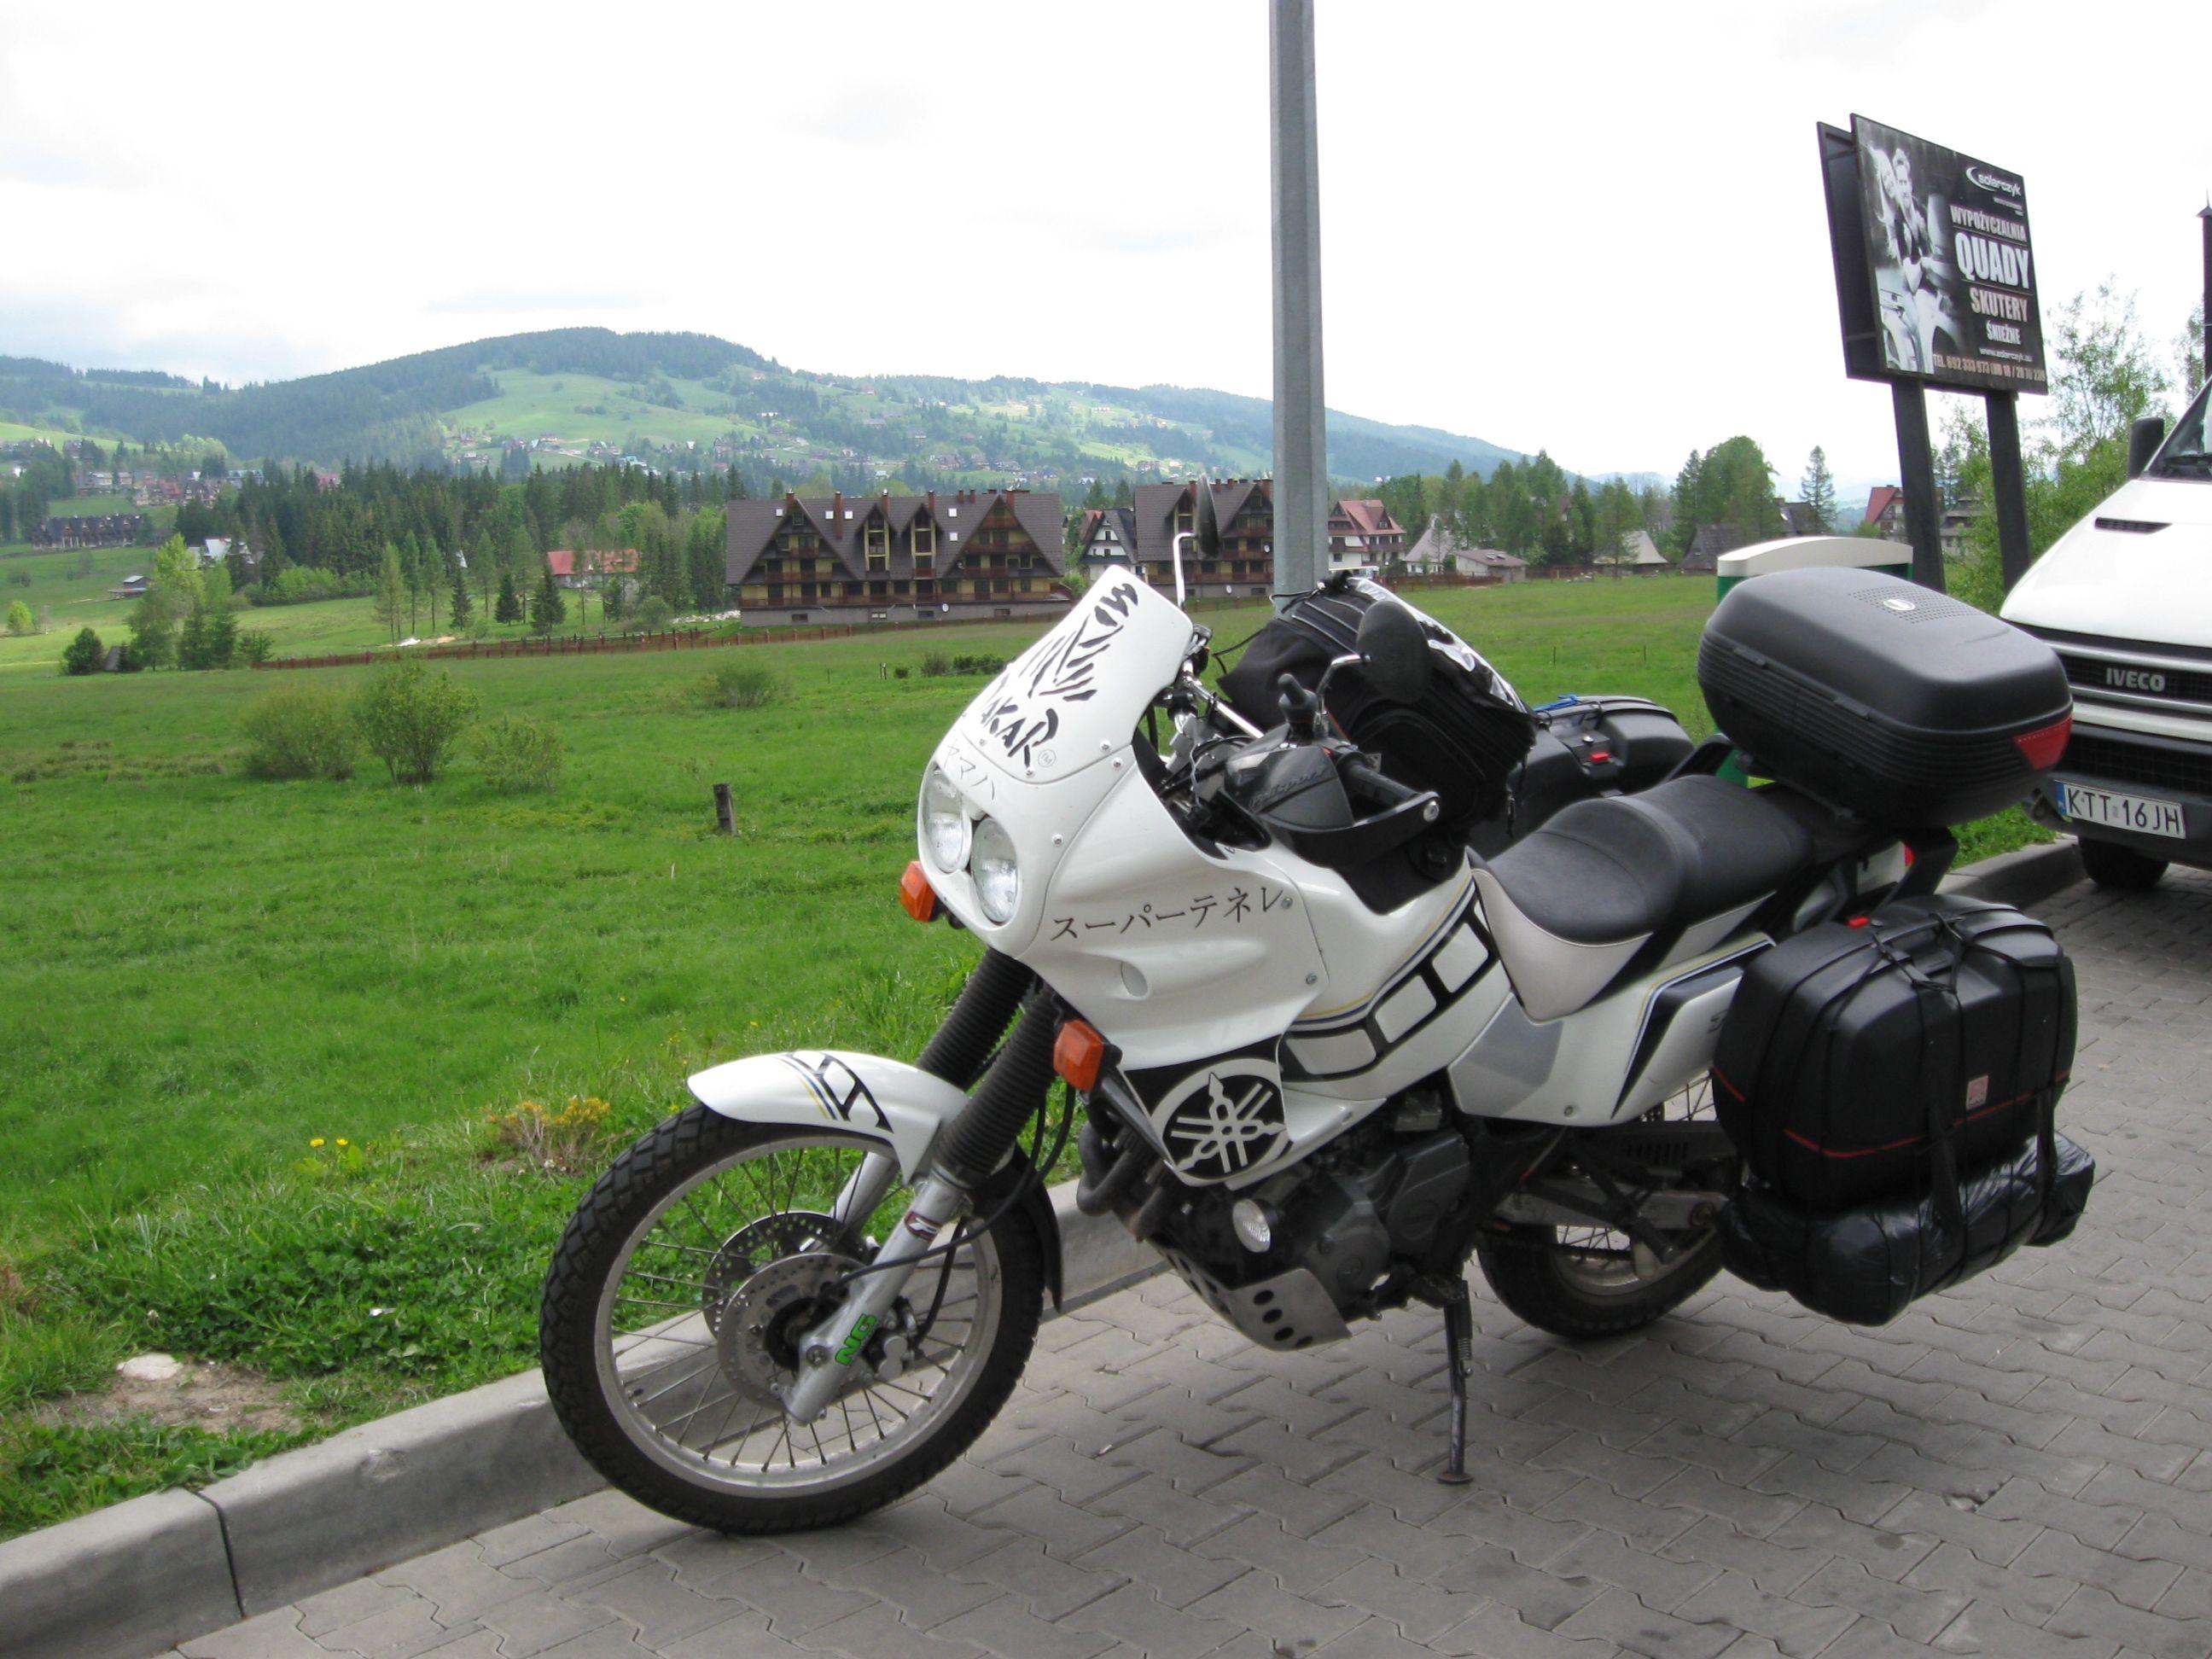 My super tenere, In Zakopane, PL.